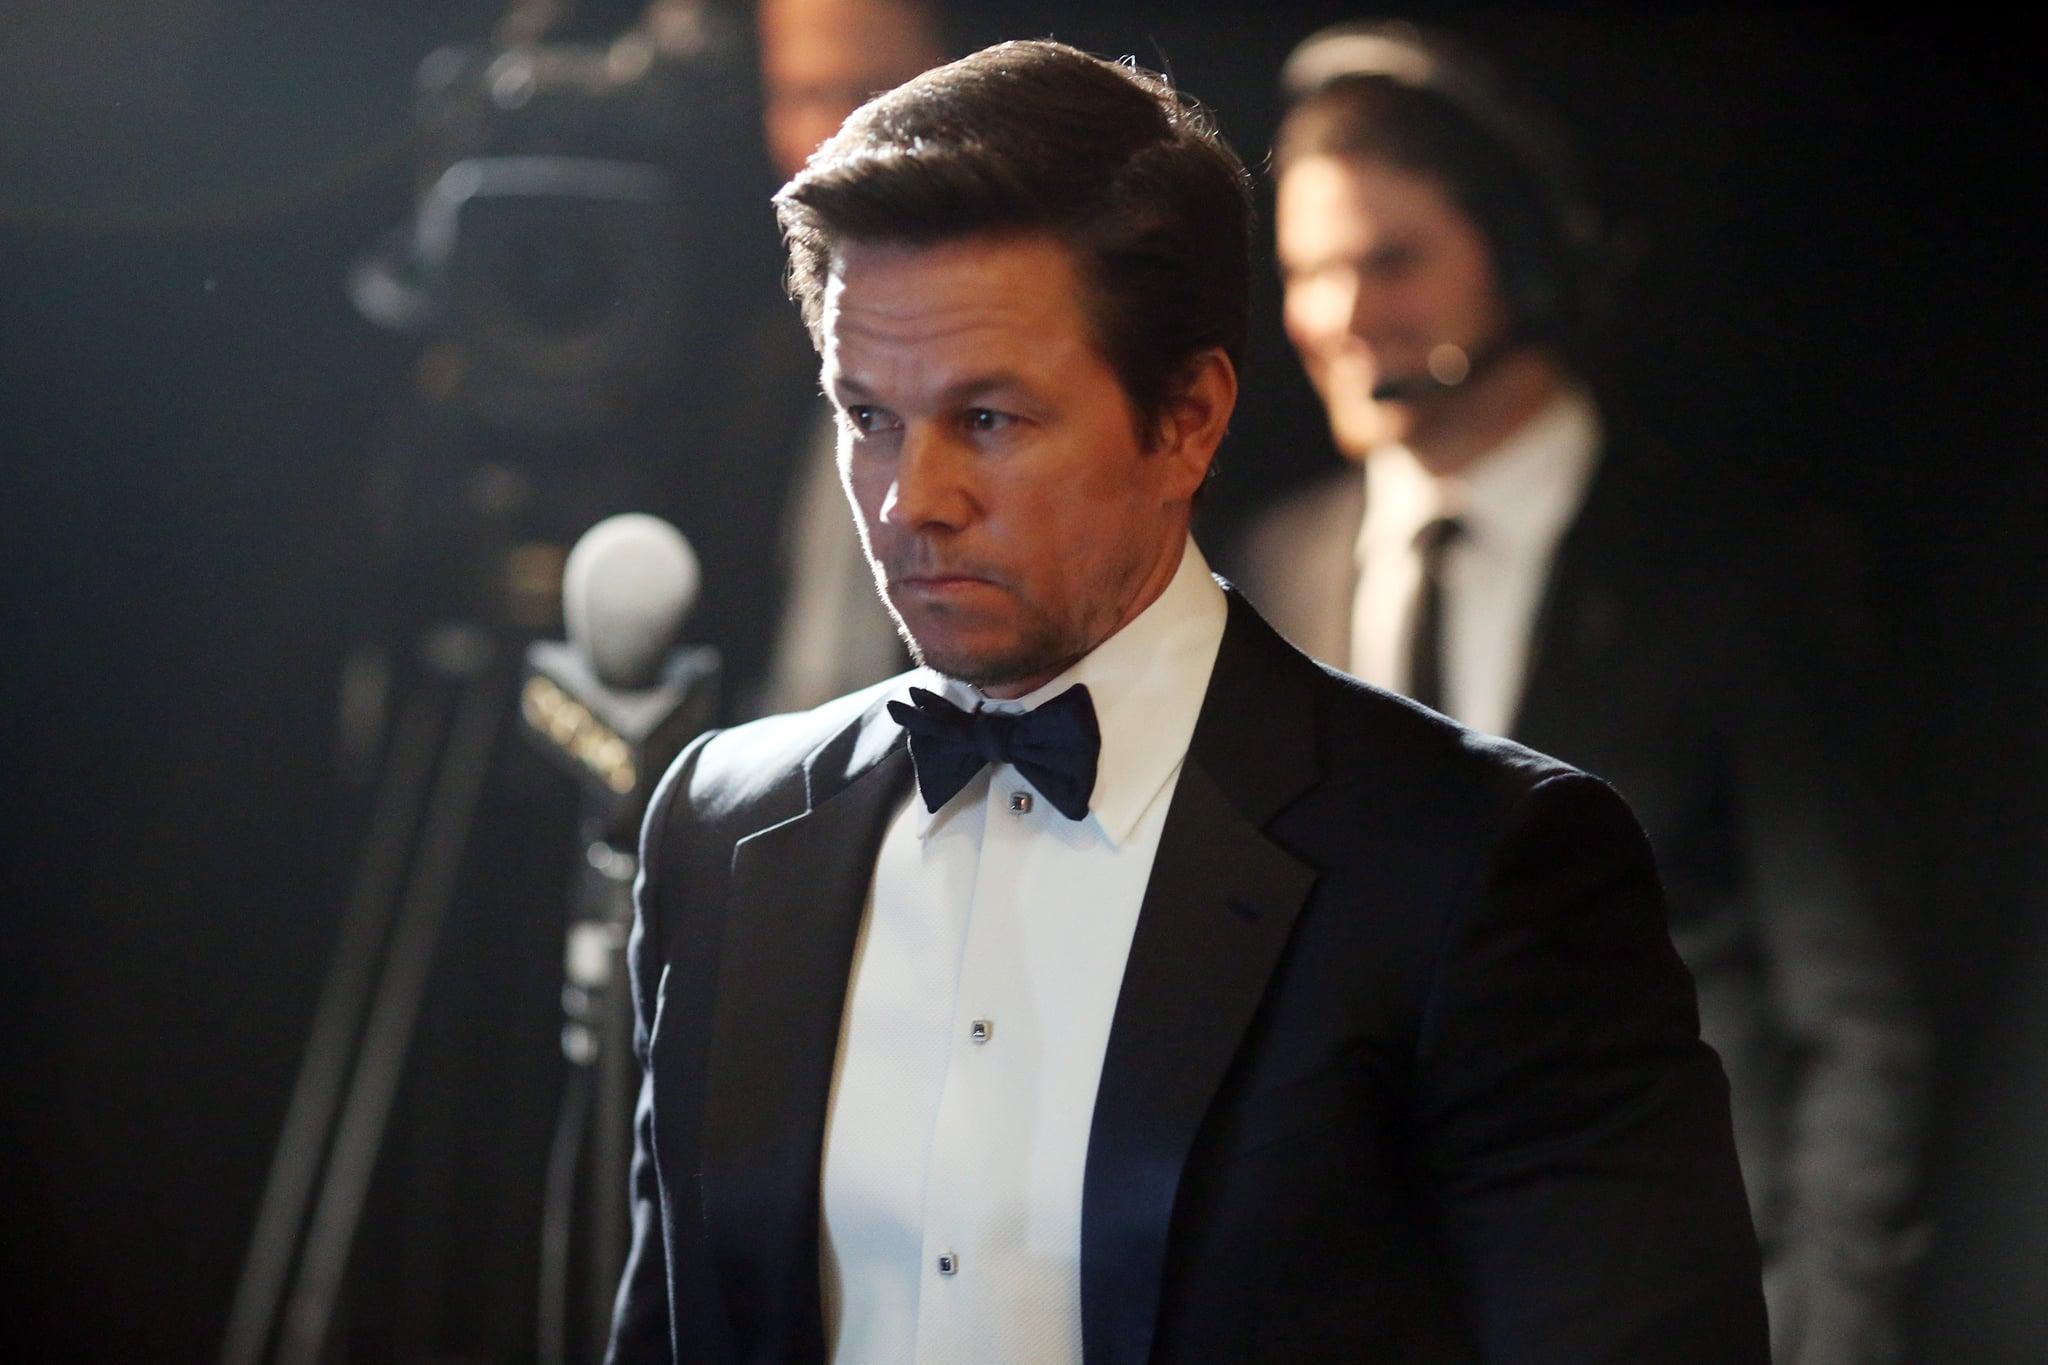 Mark Wahlberg at the 2013 Oscars.